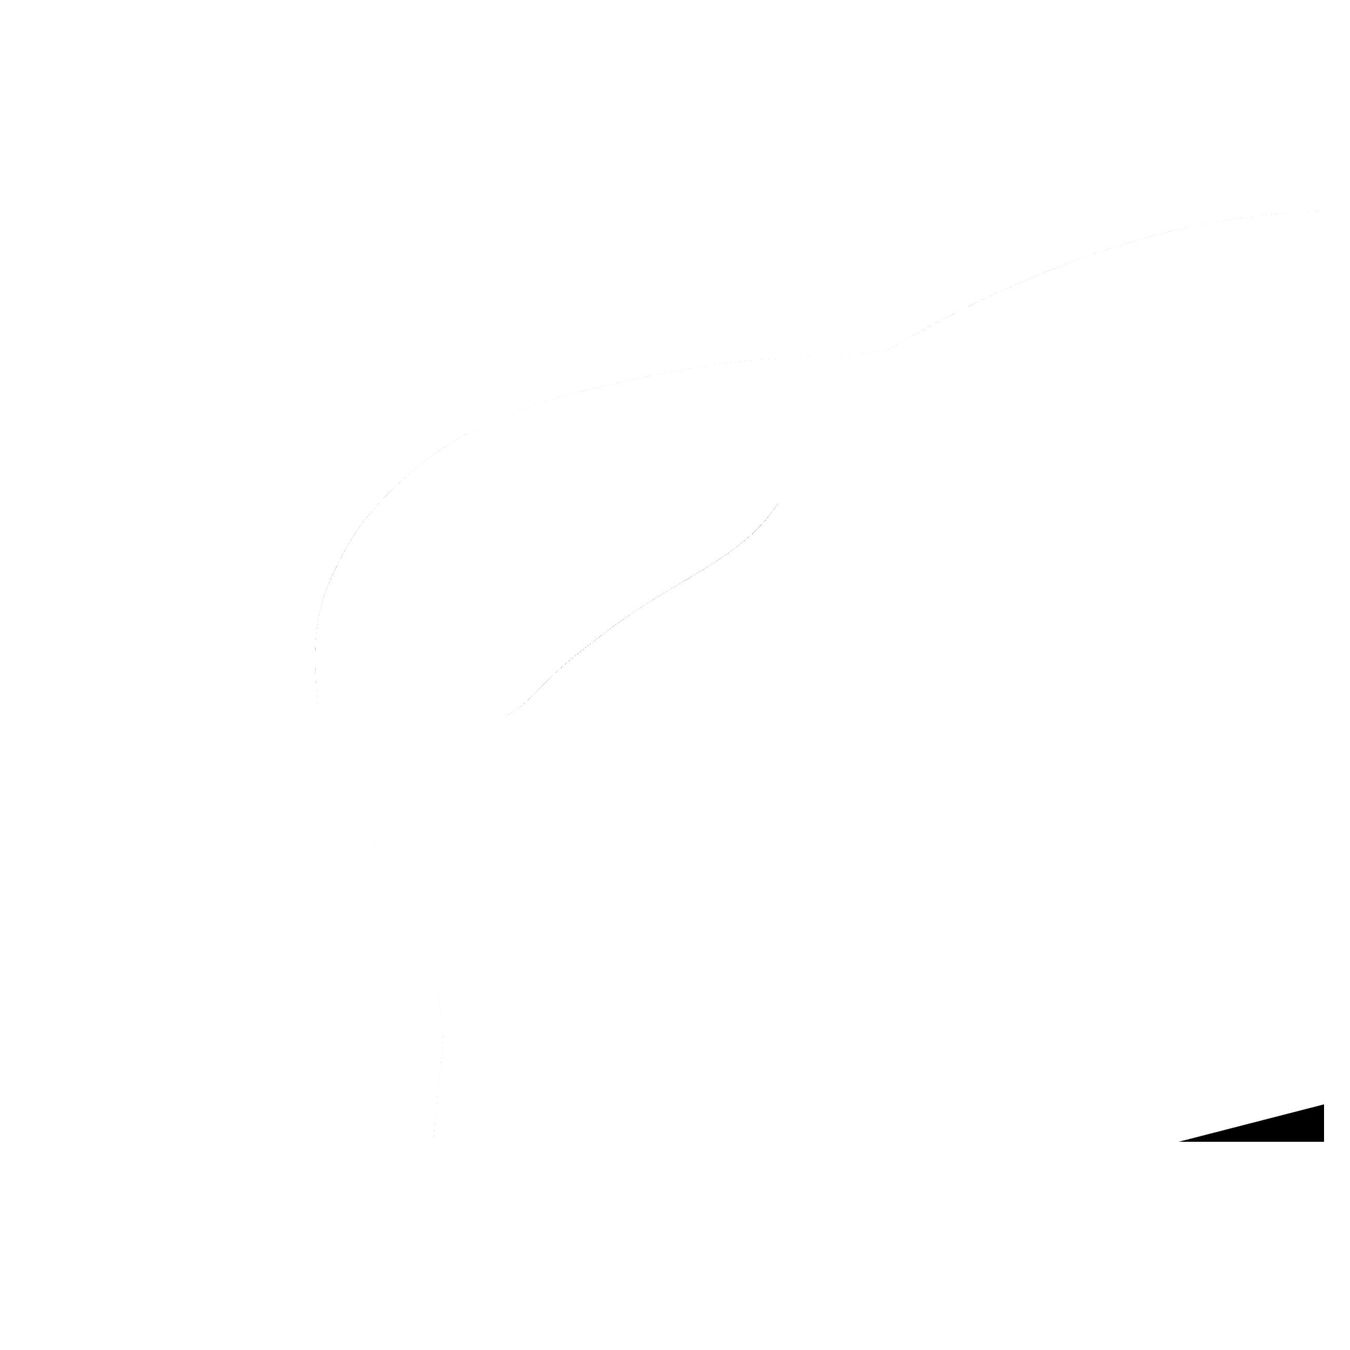 Cocotte zucca - 15 cm, Nera,,large 3